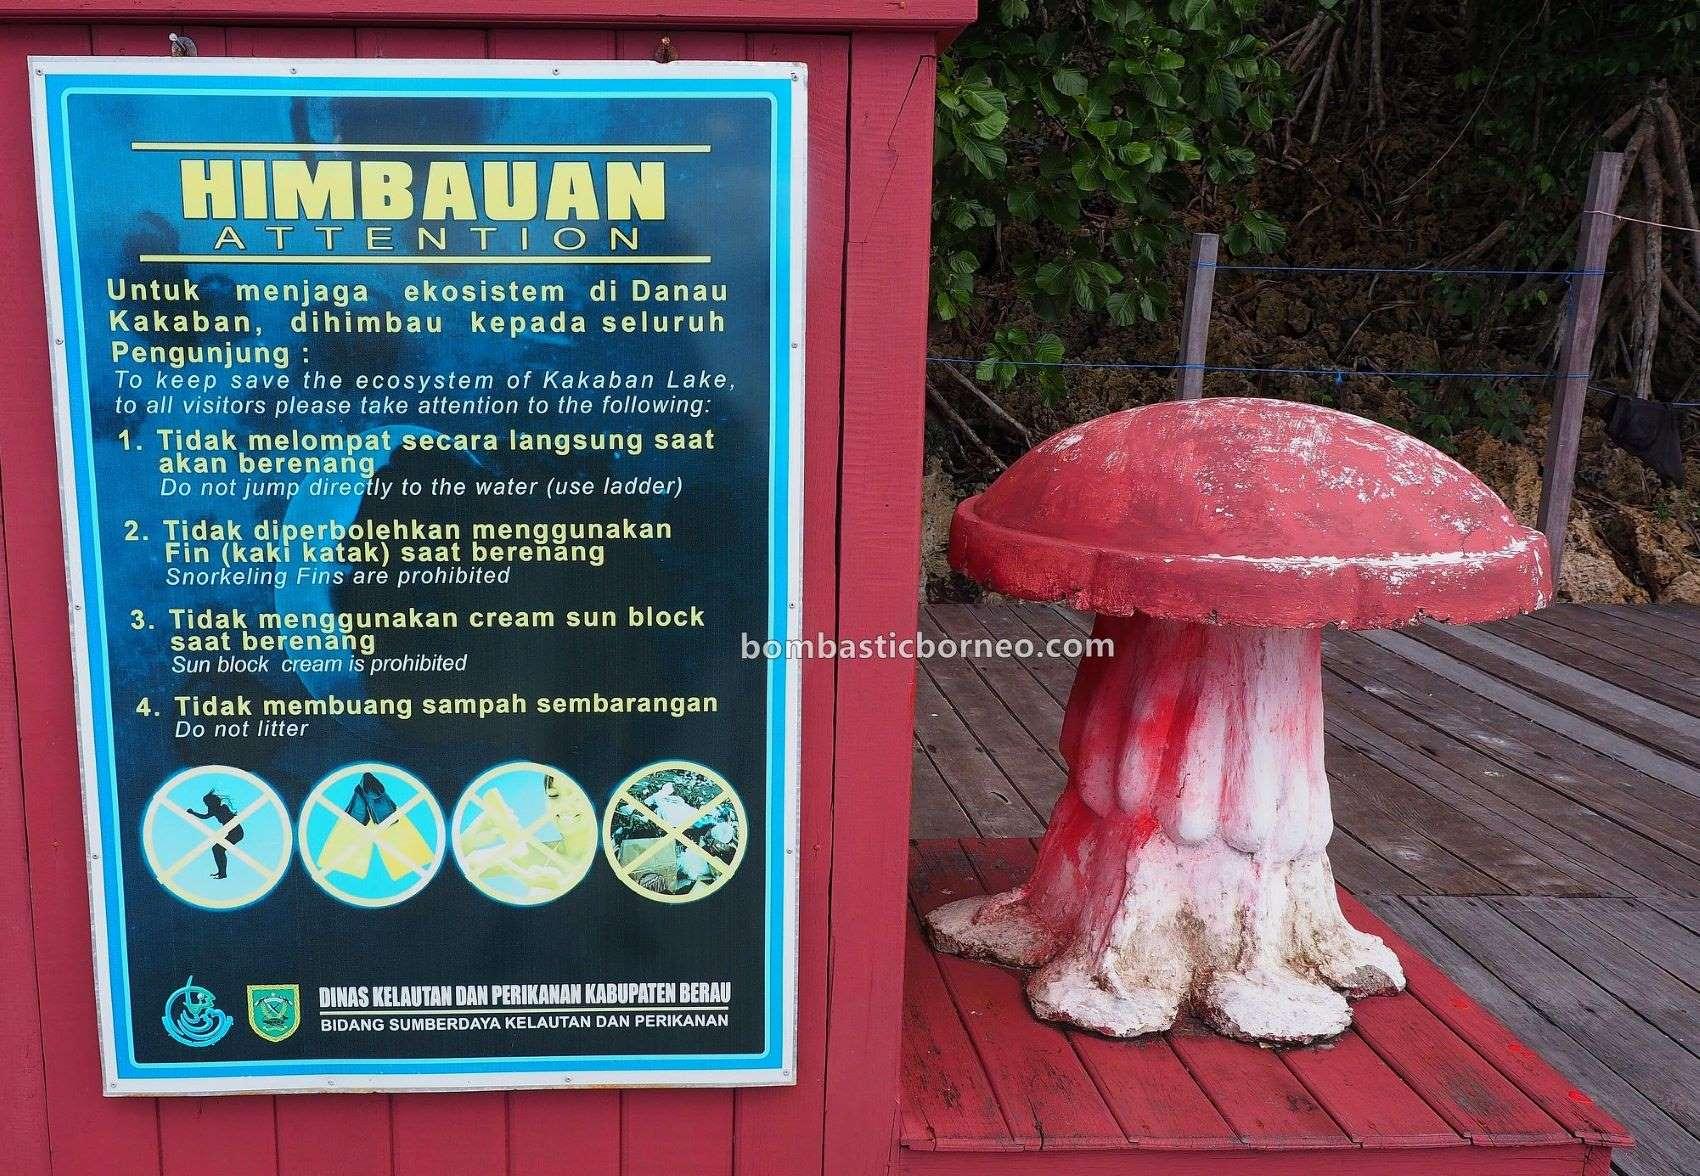 Kepulauan Derawan, Kakaban Island, Stingless Jellyfish Lake, nature, destination, exploration, mangrove forest, Berau, Kalimantan Timur, Pariwisata, Tourism, travel guide, Trans Borneo, 印尼东加里曼丹, 卡卡班岛水母天堂,